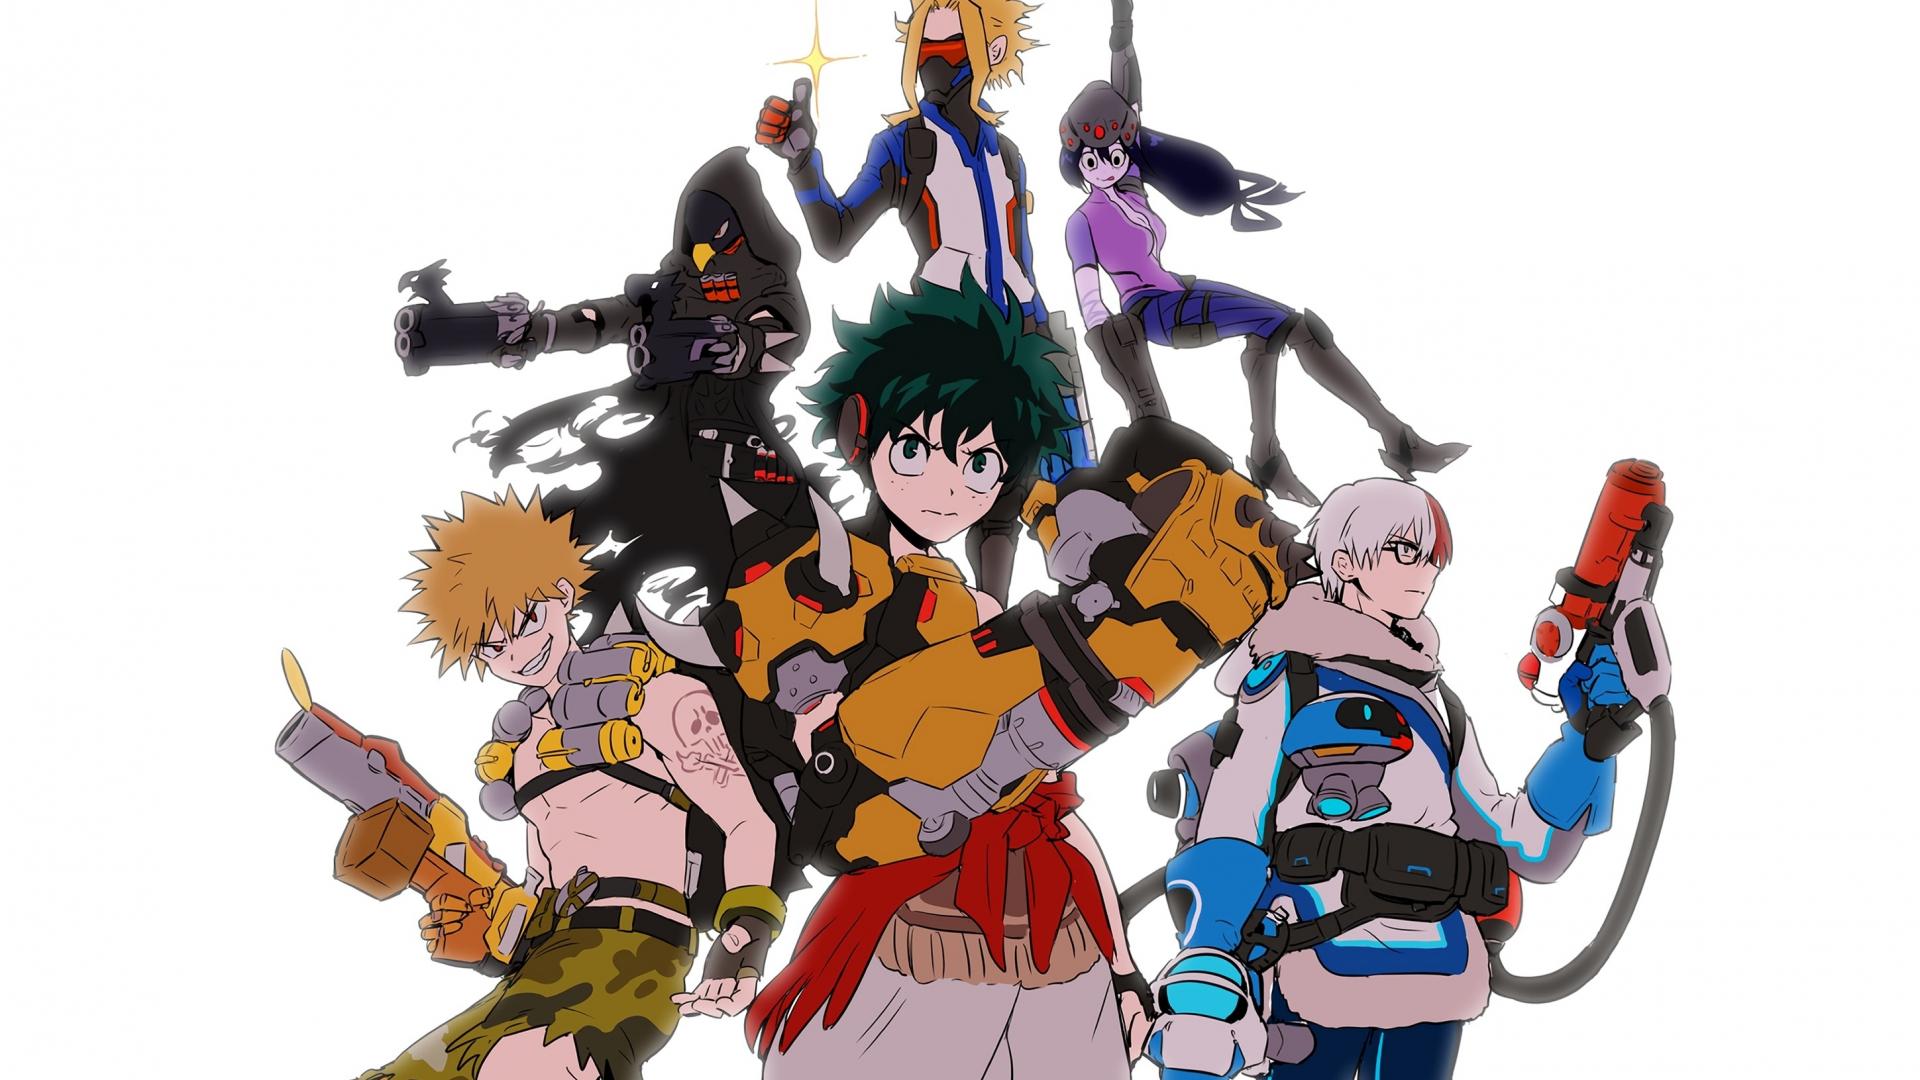 Download 1920x1080 Wallpaper Anime Boku No Hero Academia